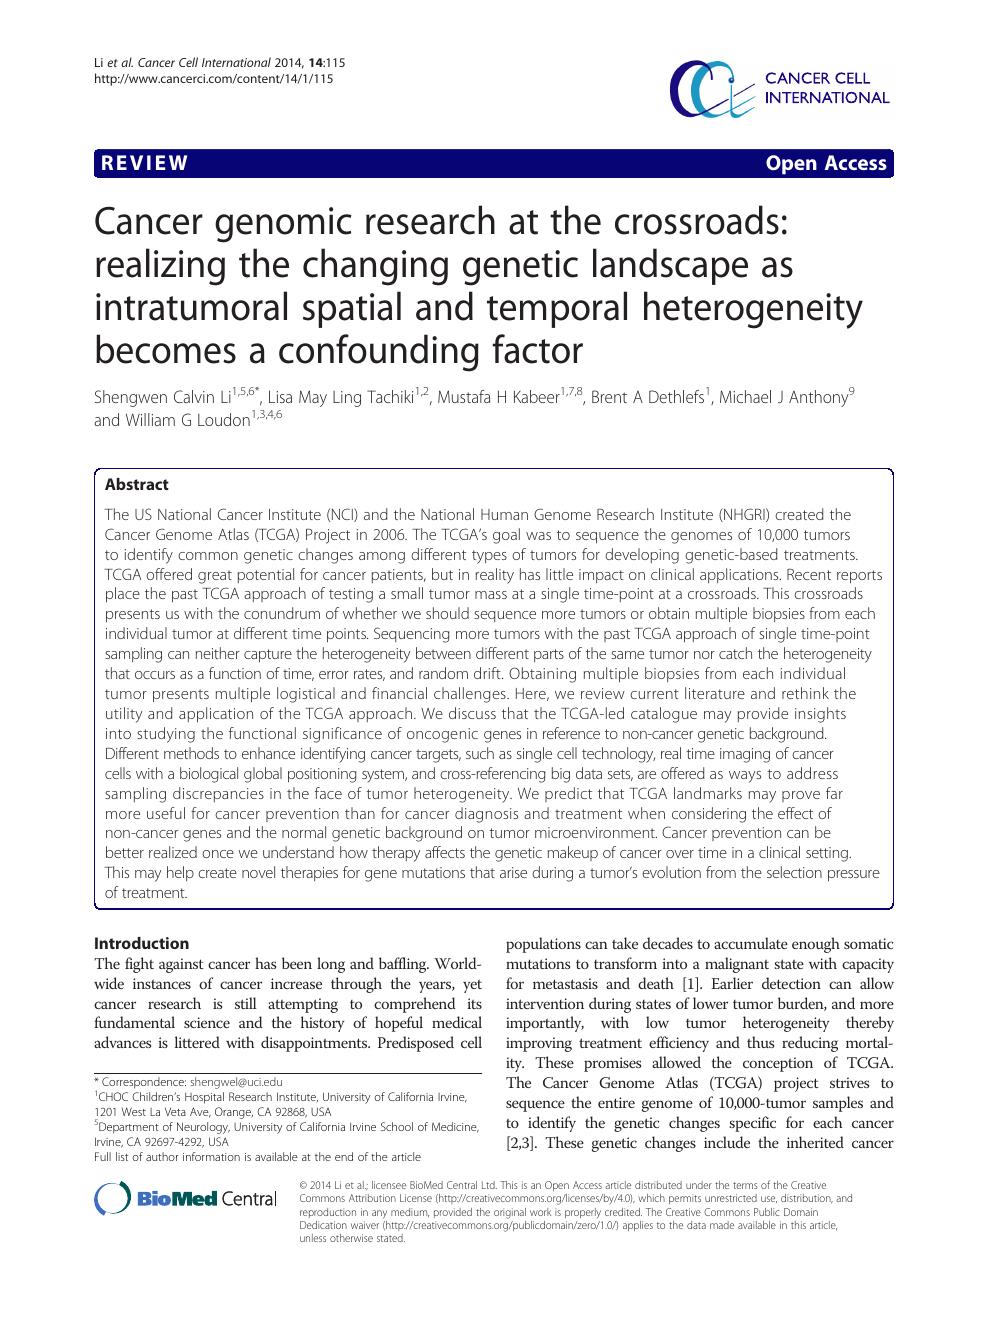 cancer genetic ltd